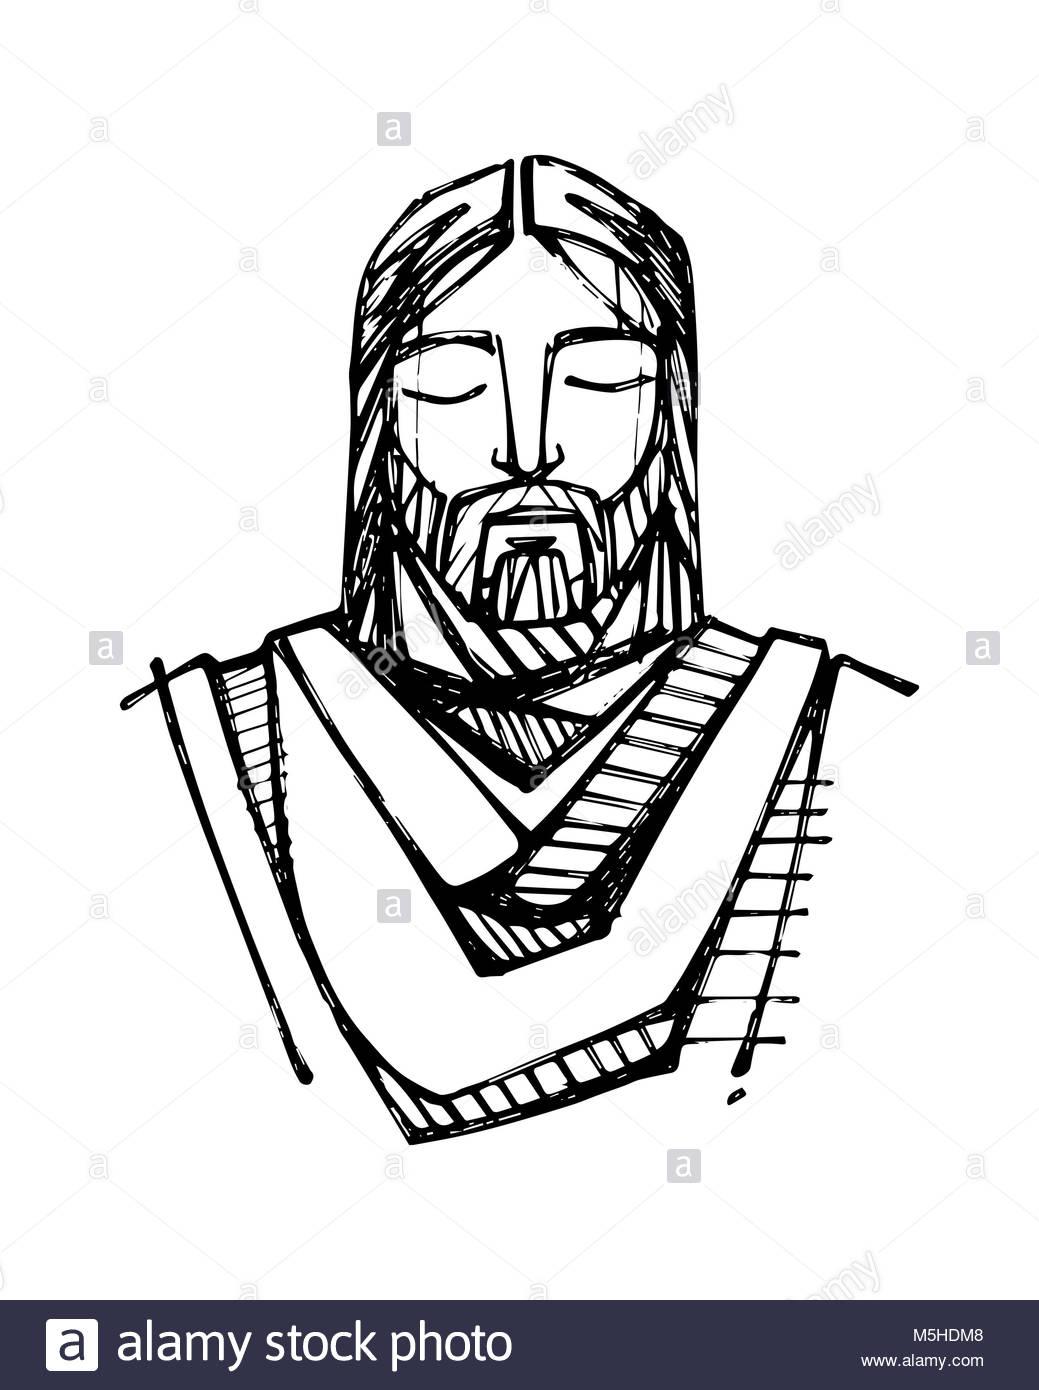 1039x1390 Hand Drawn Illustration Drawing Jesus Black And White Stock Photos